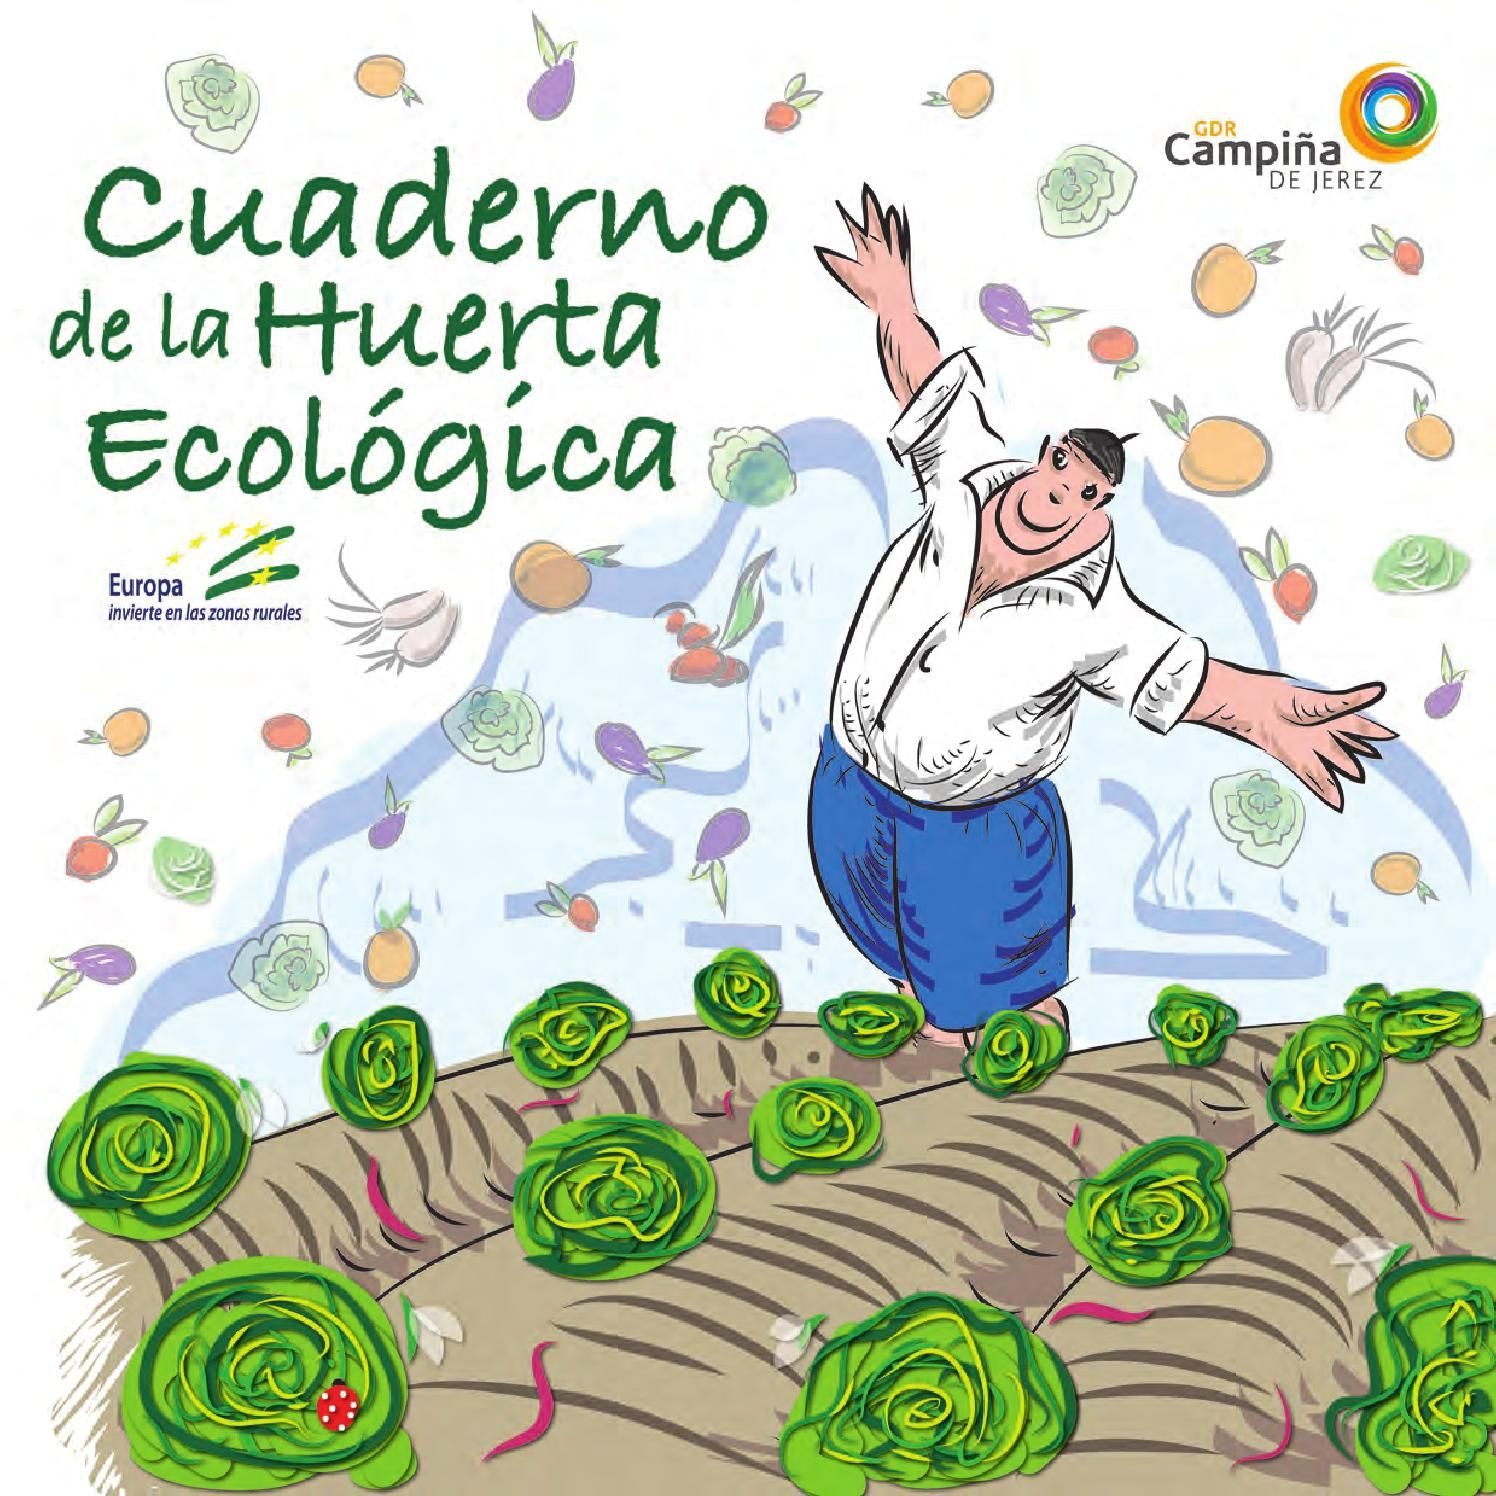 Cuaderno De La Huerta Ecologica Huerta Huerto Y Huerto Ecologico ~ Como Hacer Una Huerta Ecologica